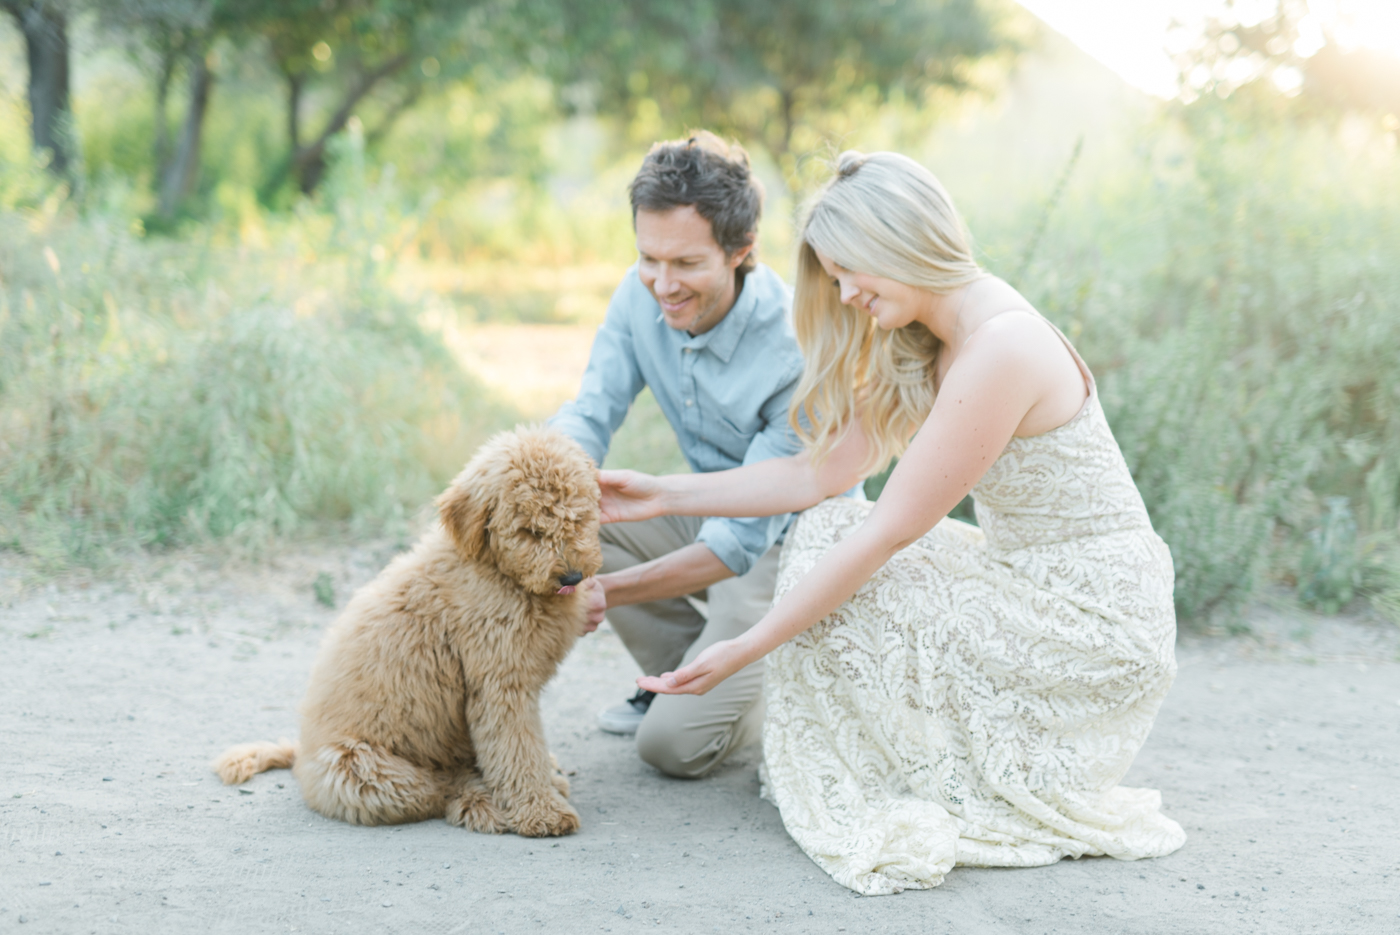 San_Juan_Capistrano_Goldendoodle_family_portrait_session_los_angeles_wedding_photographer-9.jpg